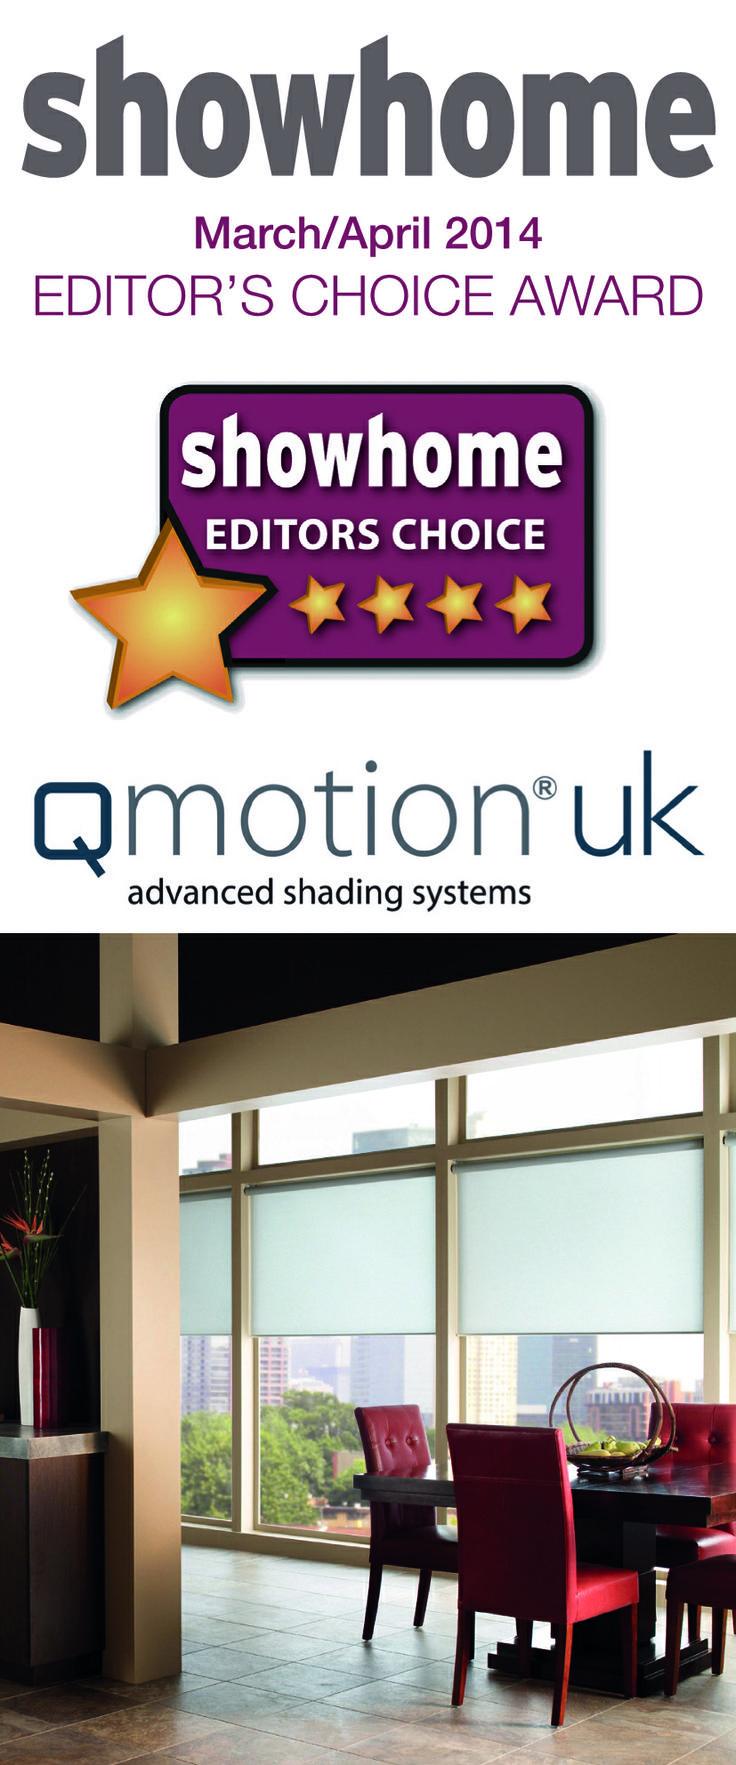 QMotion UK wins the Showhome editor choice award.